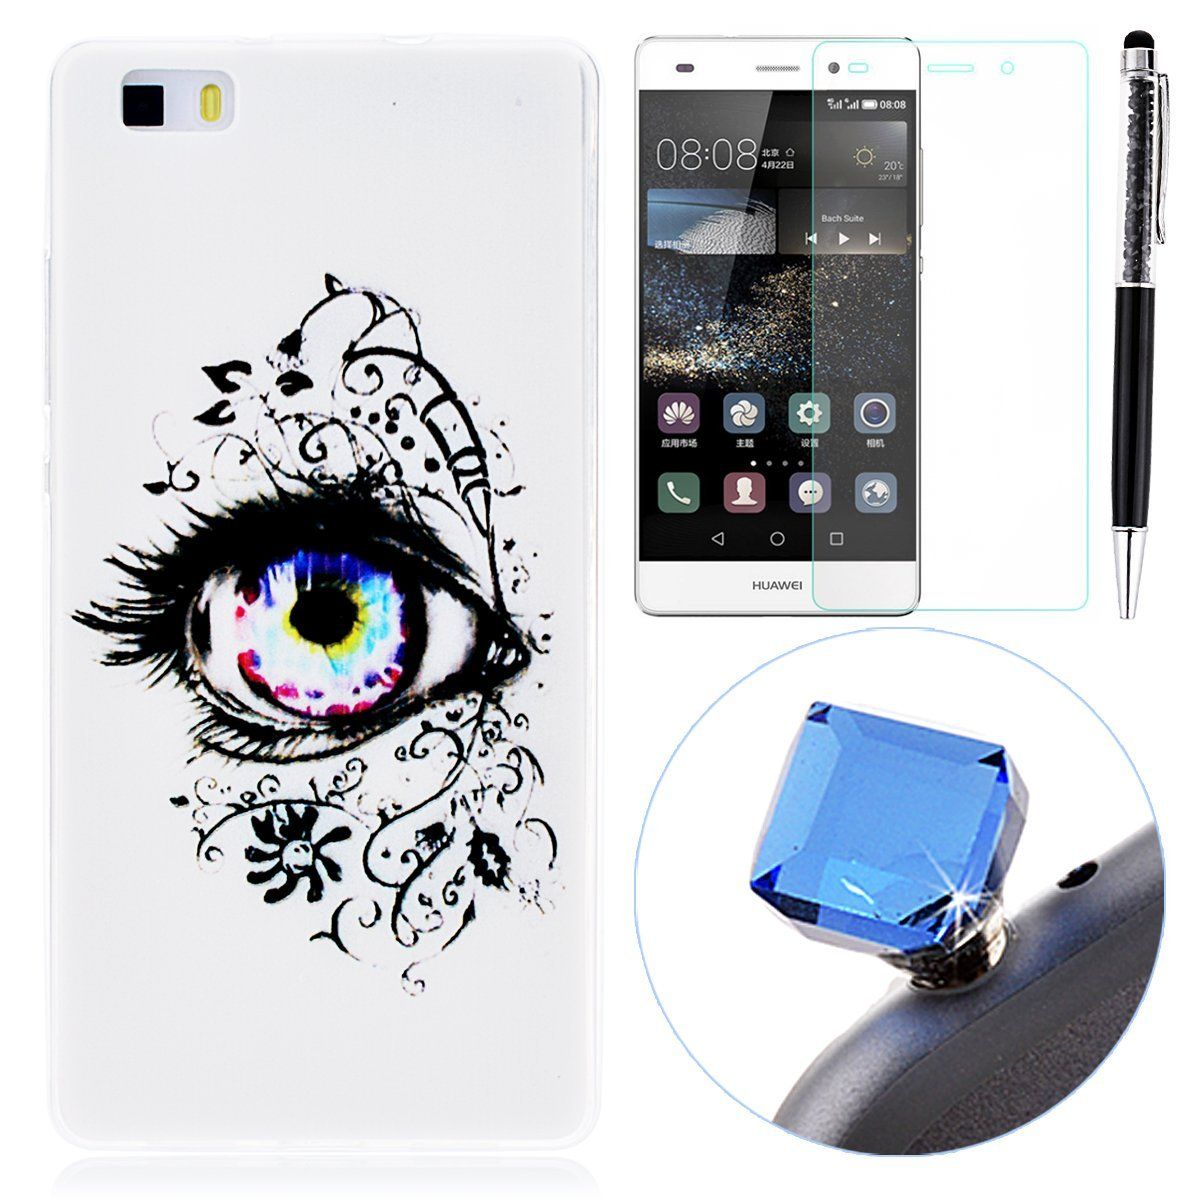 Grandever Silikon Tpu Hulle Fur Huawei P8 Lite Handy Tasche Case